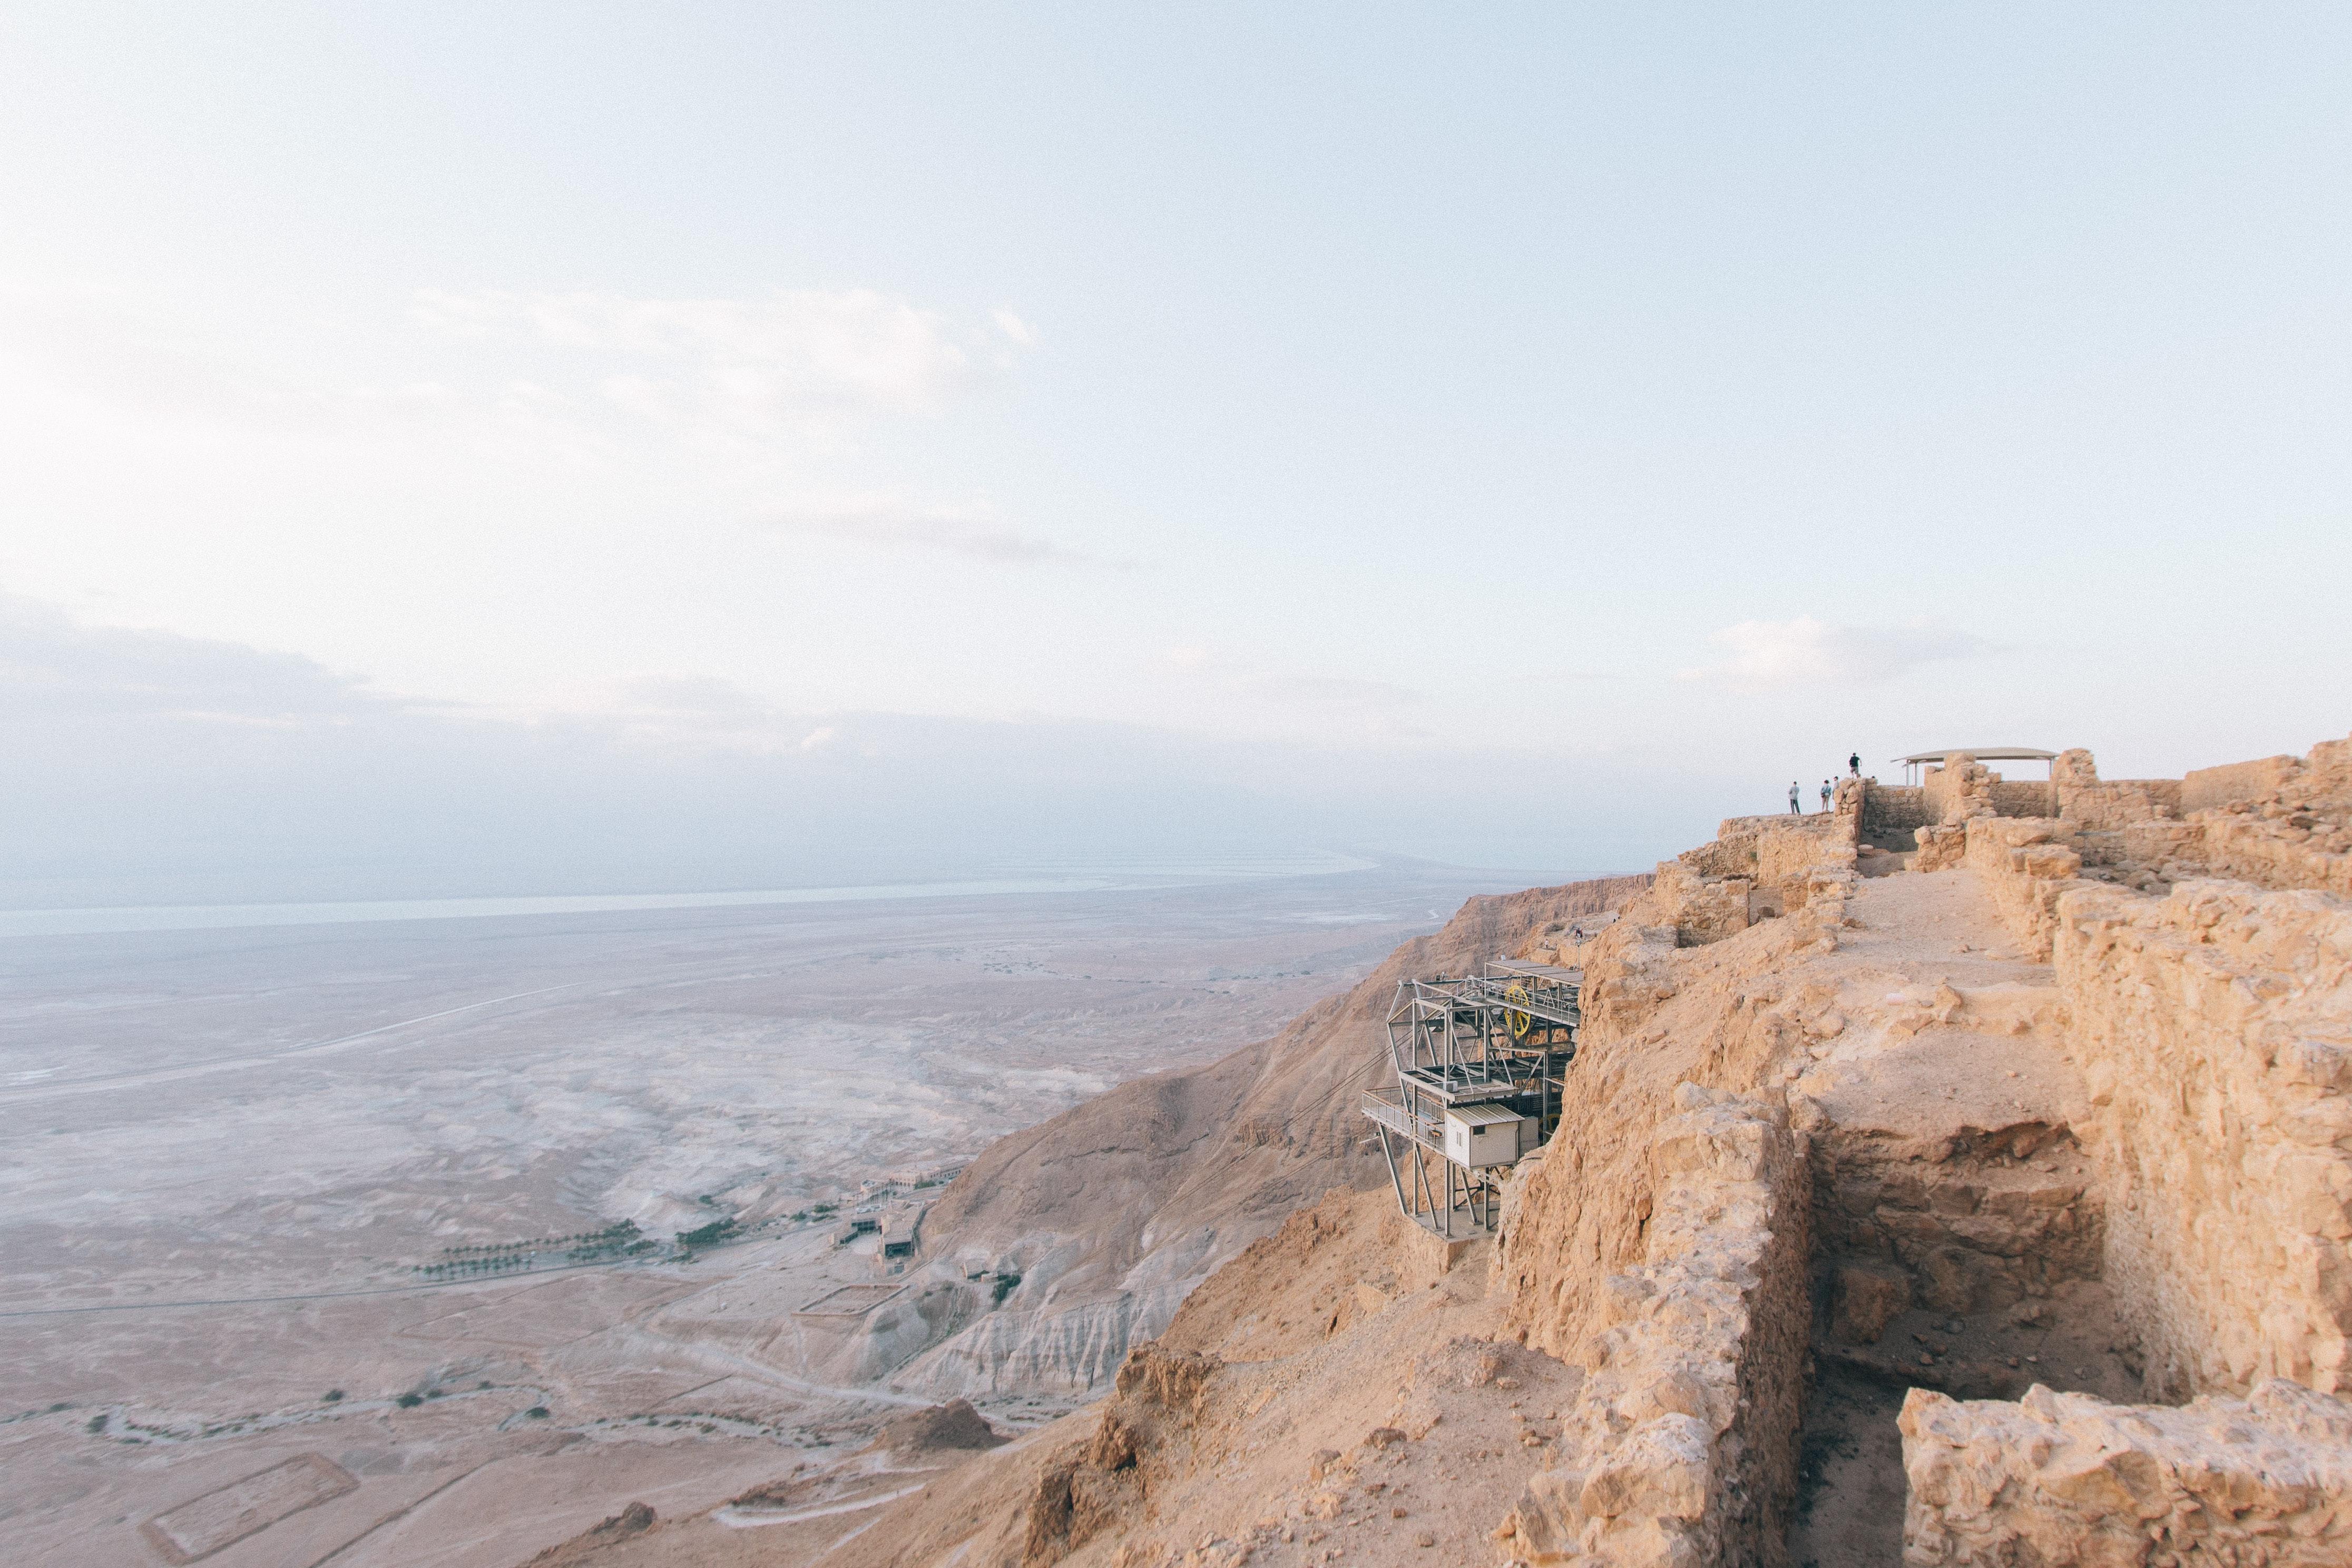 Nazareth Photo by Robert Bye